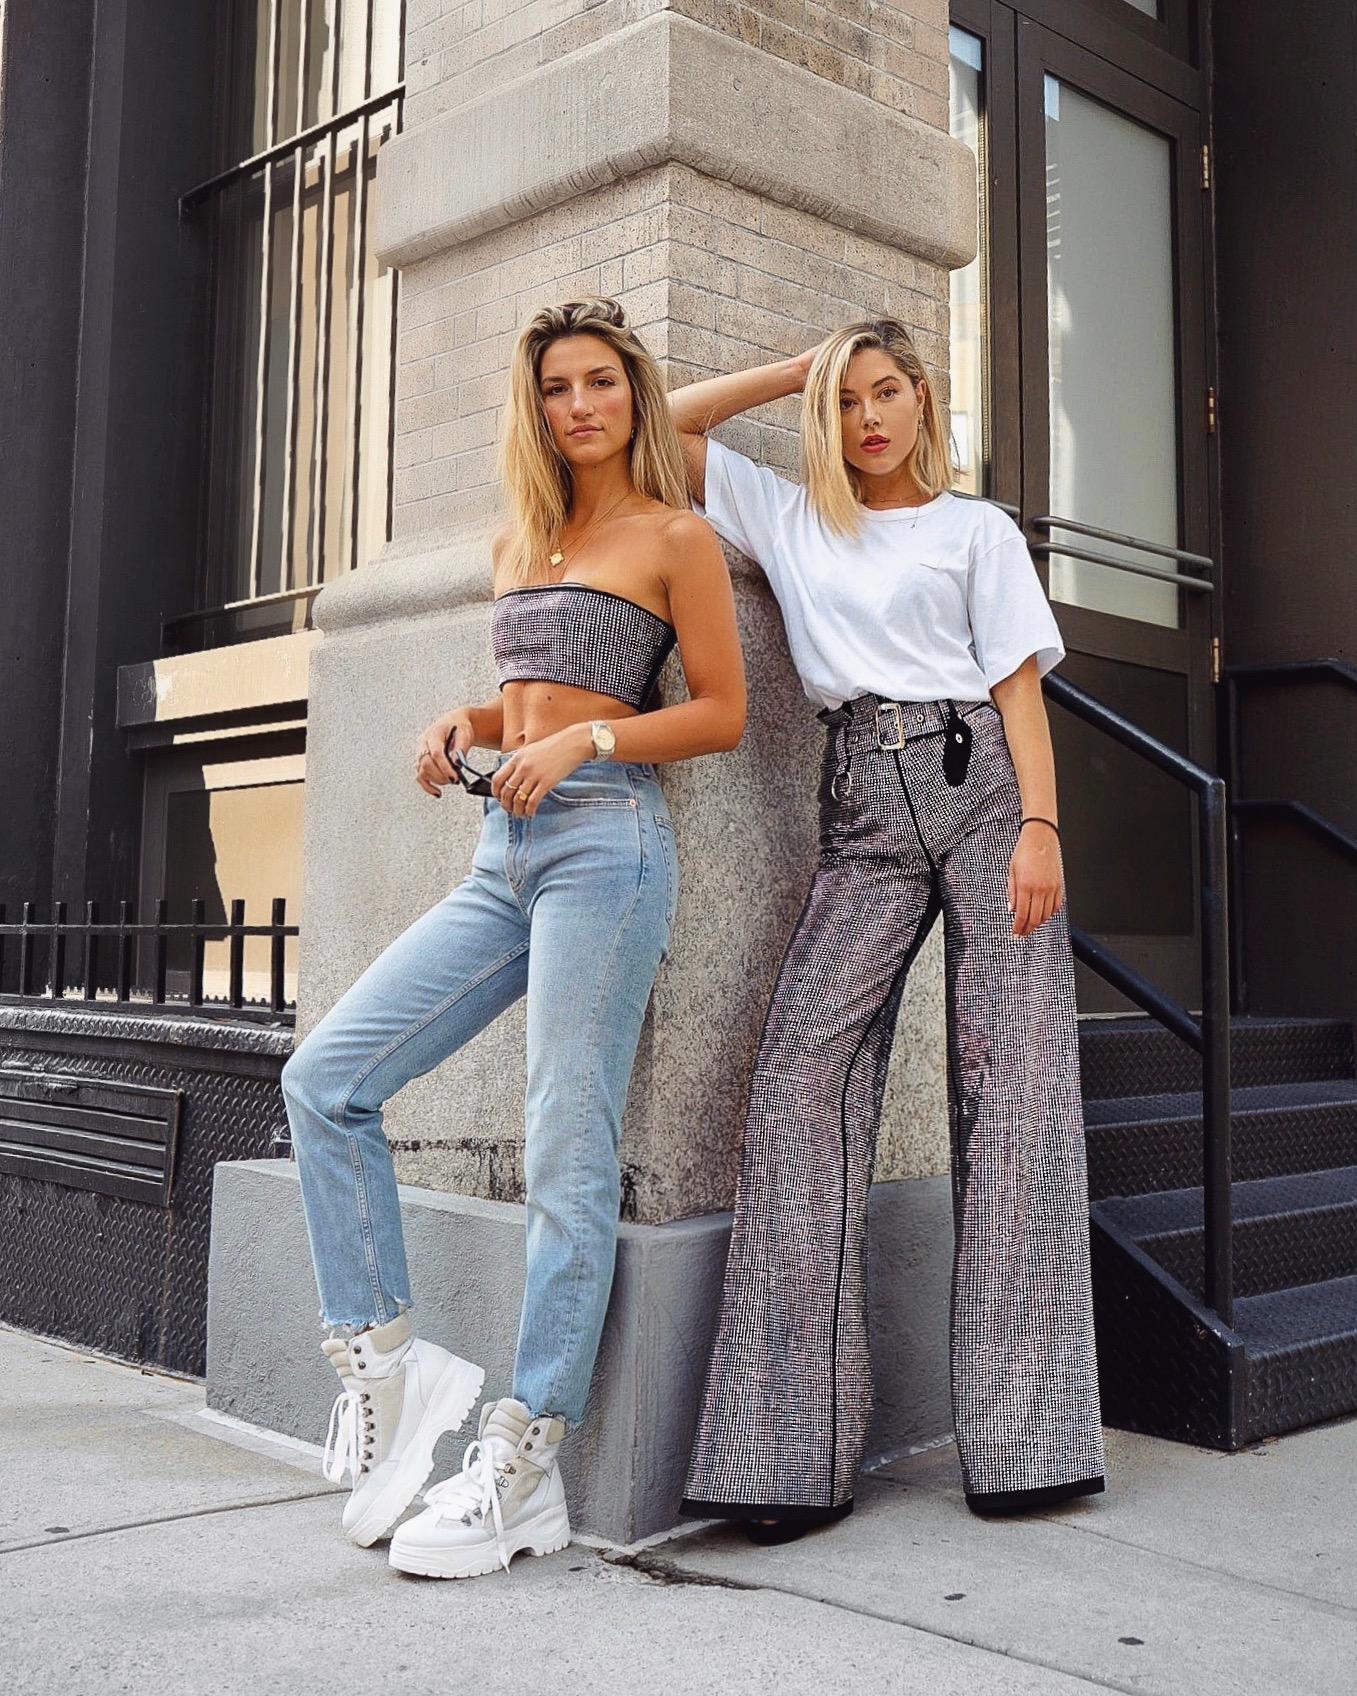 Cassandra DiMicco, Cass DiMicco, Dressed For Dreams, NYC, New York City, New York, Street Style NYC, Street Style 2018, NYC Street Style, NYC Outfit Inspo Street Style Outfits, 2018 Trends, Summer Style, Summer Outfit Inspo, NYC Fashion Blogger, NYC Fashion Blogger, NYC to do list, NYC to do, NYC bucket list, NYC Instagram Spots, Jourdan Sloane, TopShop, Zara, I.Am.Gia, I am Gia, Outfit Goals, Biker boots, unfinished hem jeans, aurora bandeau, aurora pants, I am gia aurora bandeau, I gia aurora pants